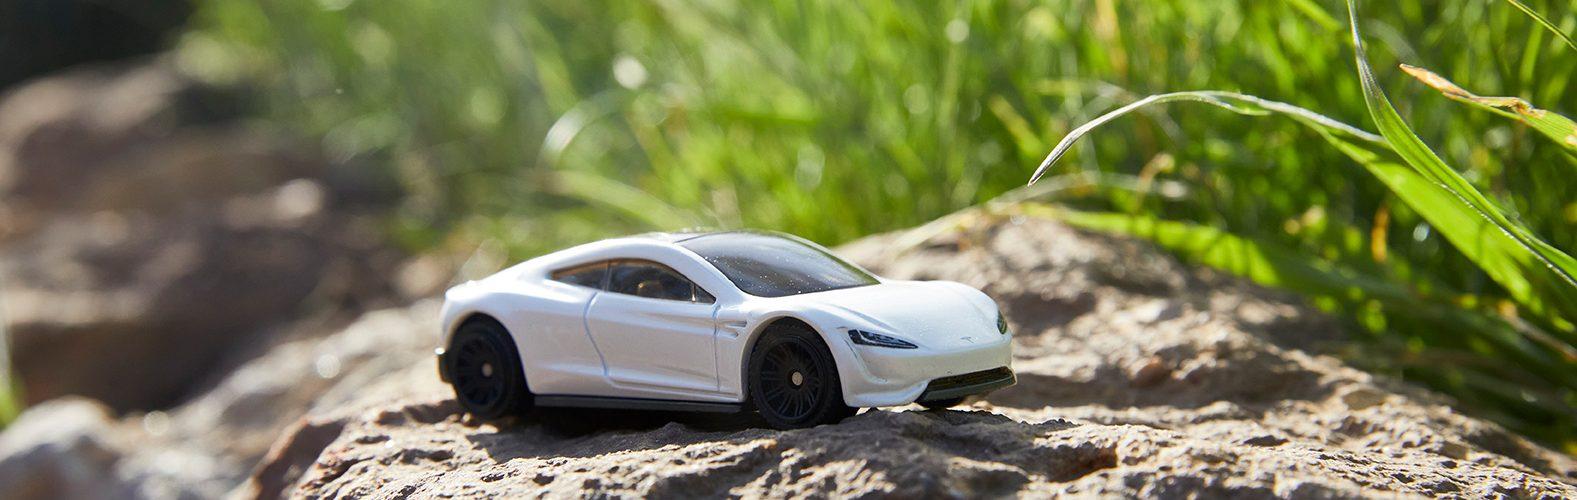 20210415 2021 Matchbox Tesla Roadster 01